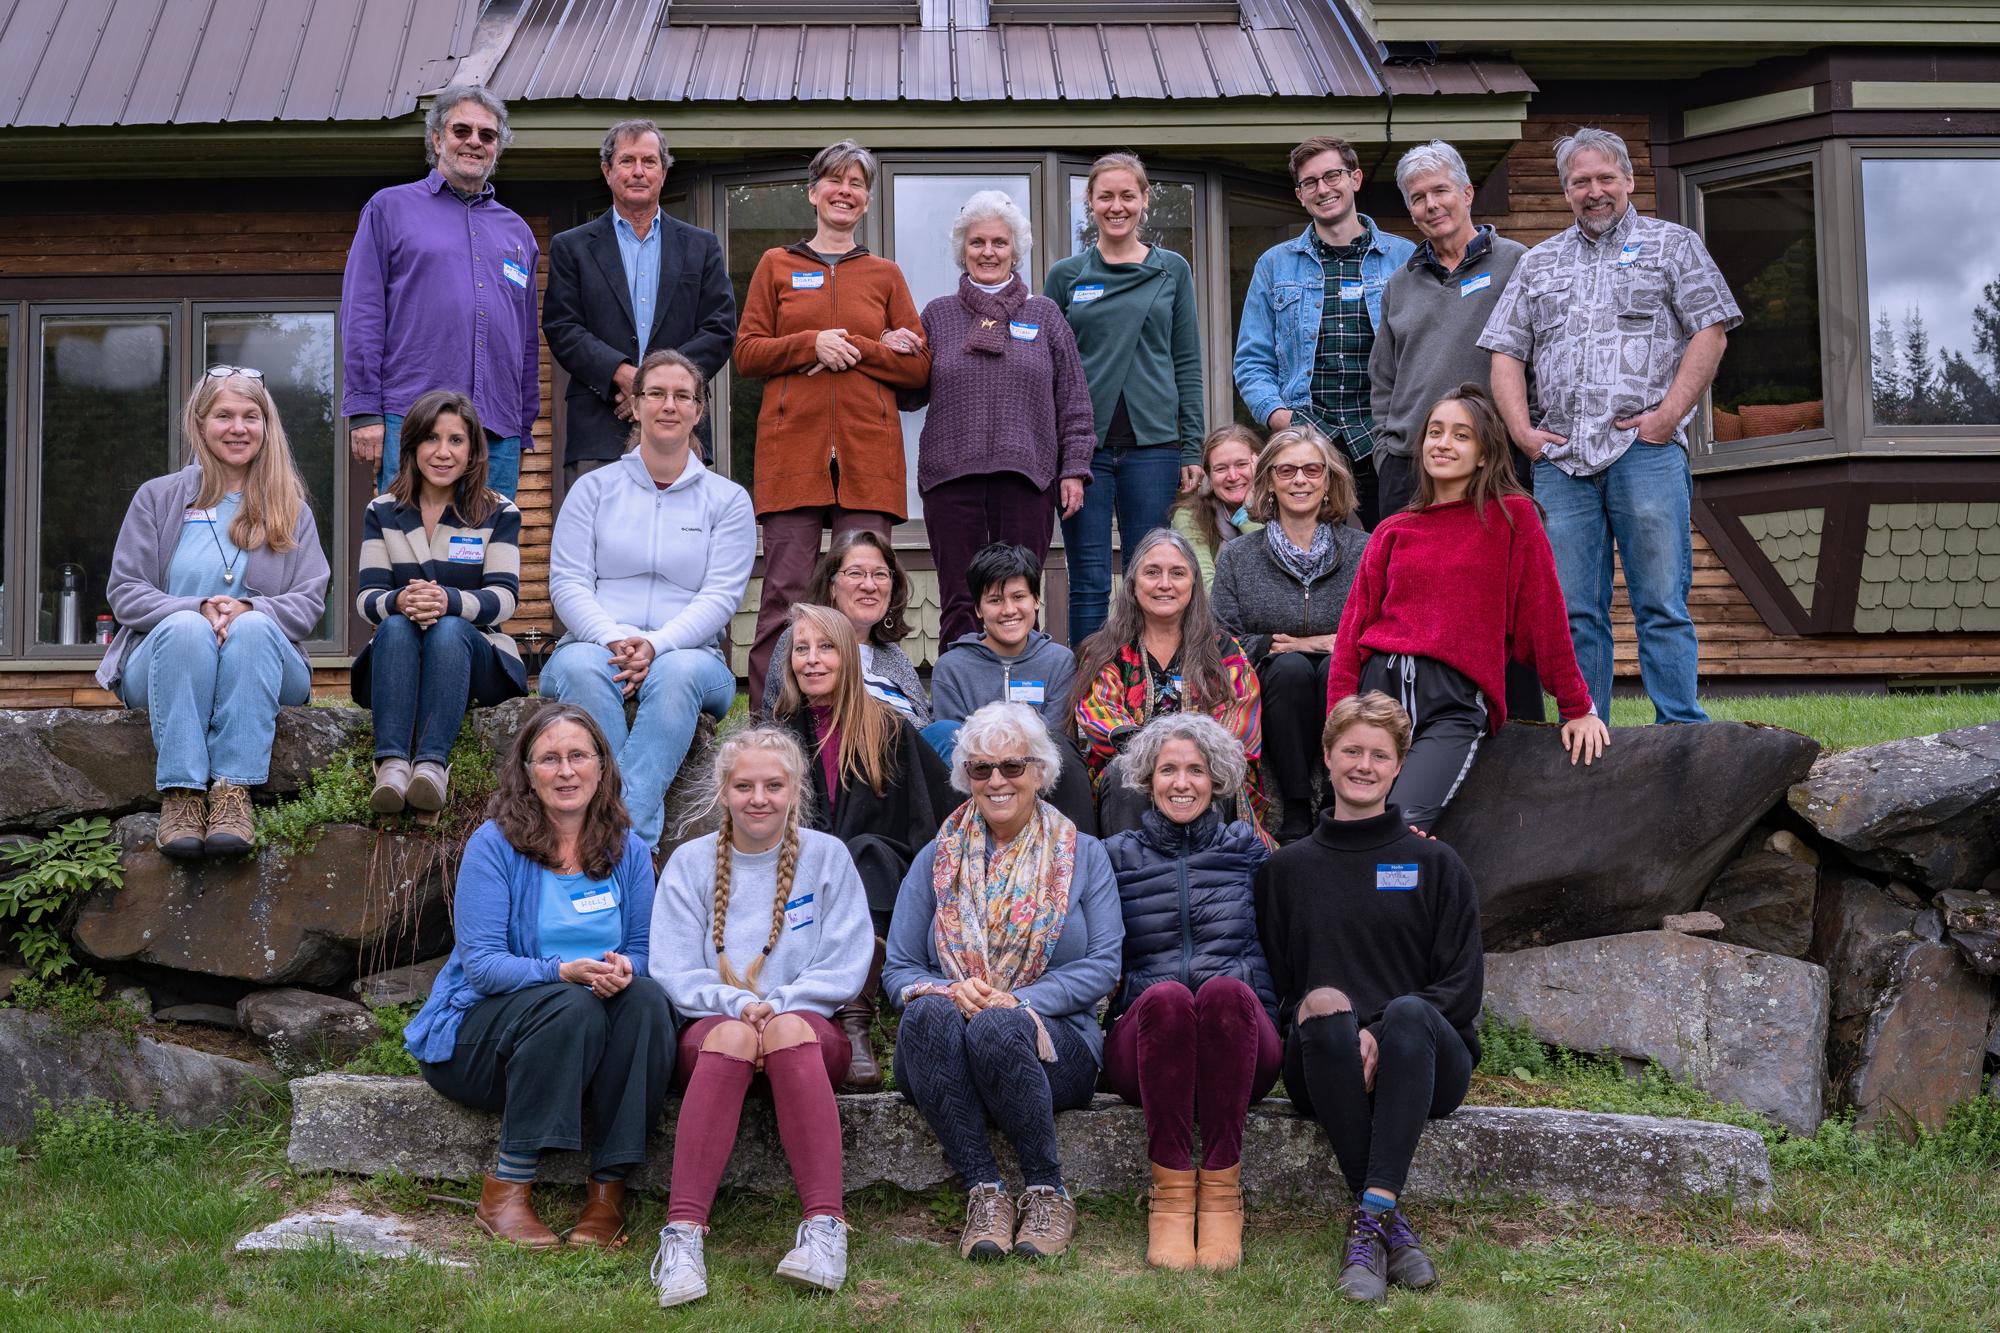 Fall 2018 Intergenerational Leadership Exchange